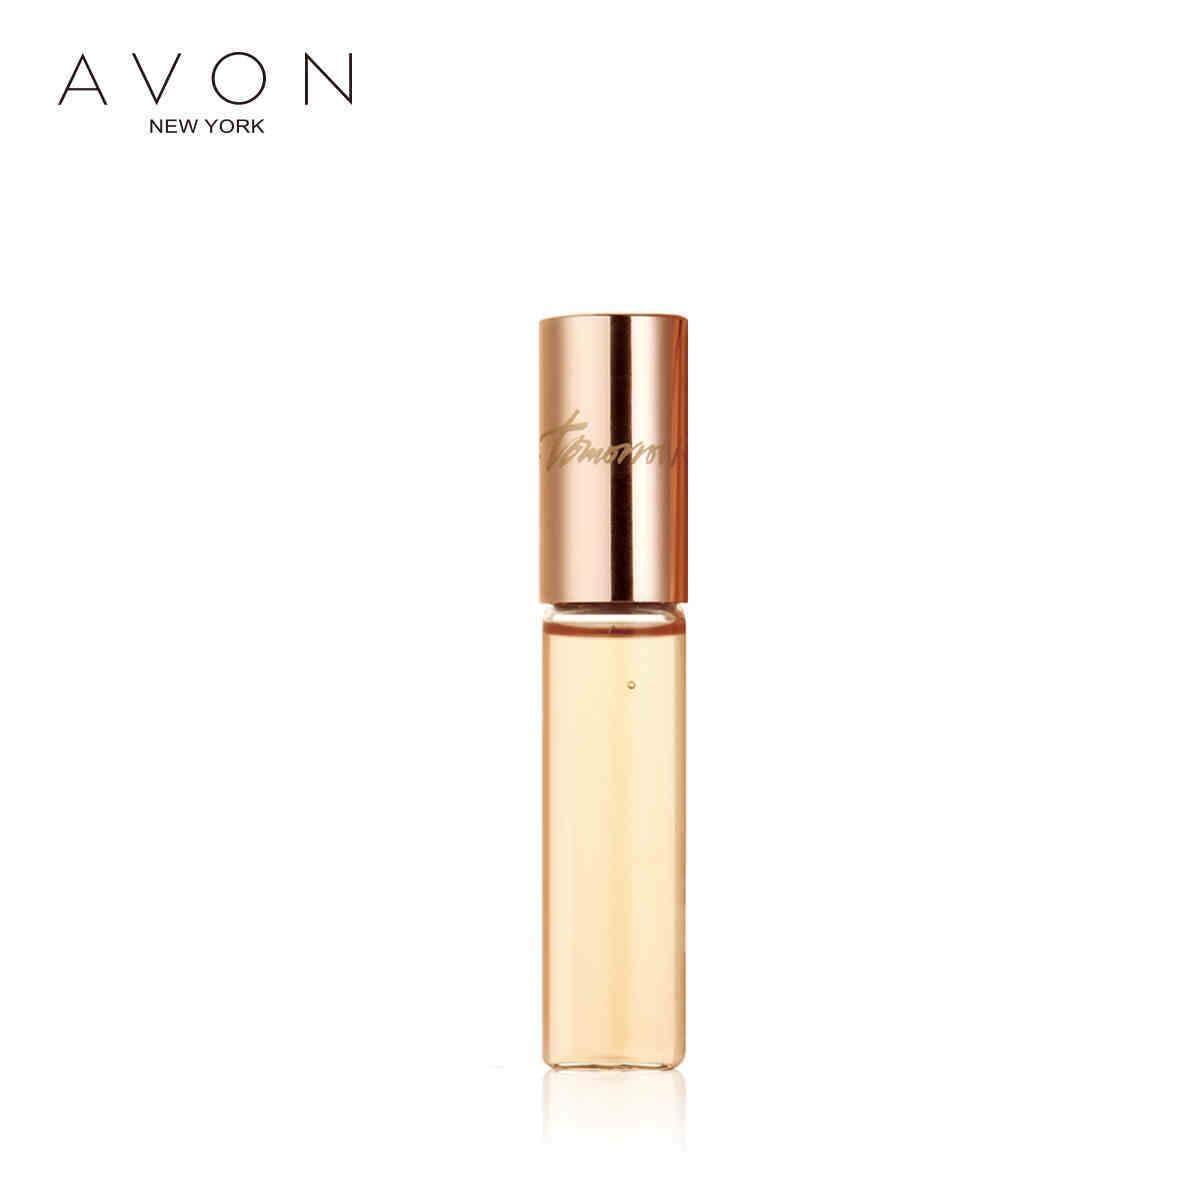 Avon Parfum Kelereng TENGA Romantis Bunga